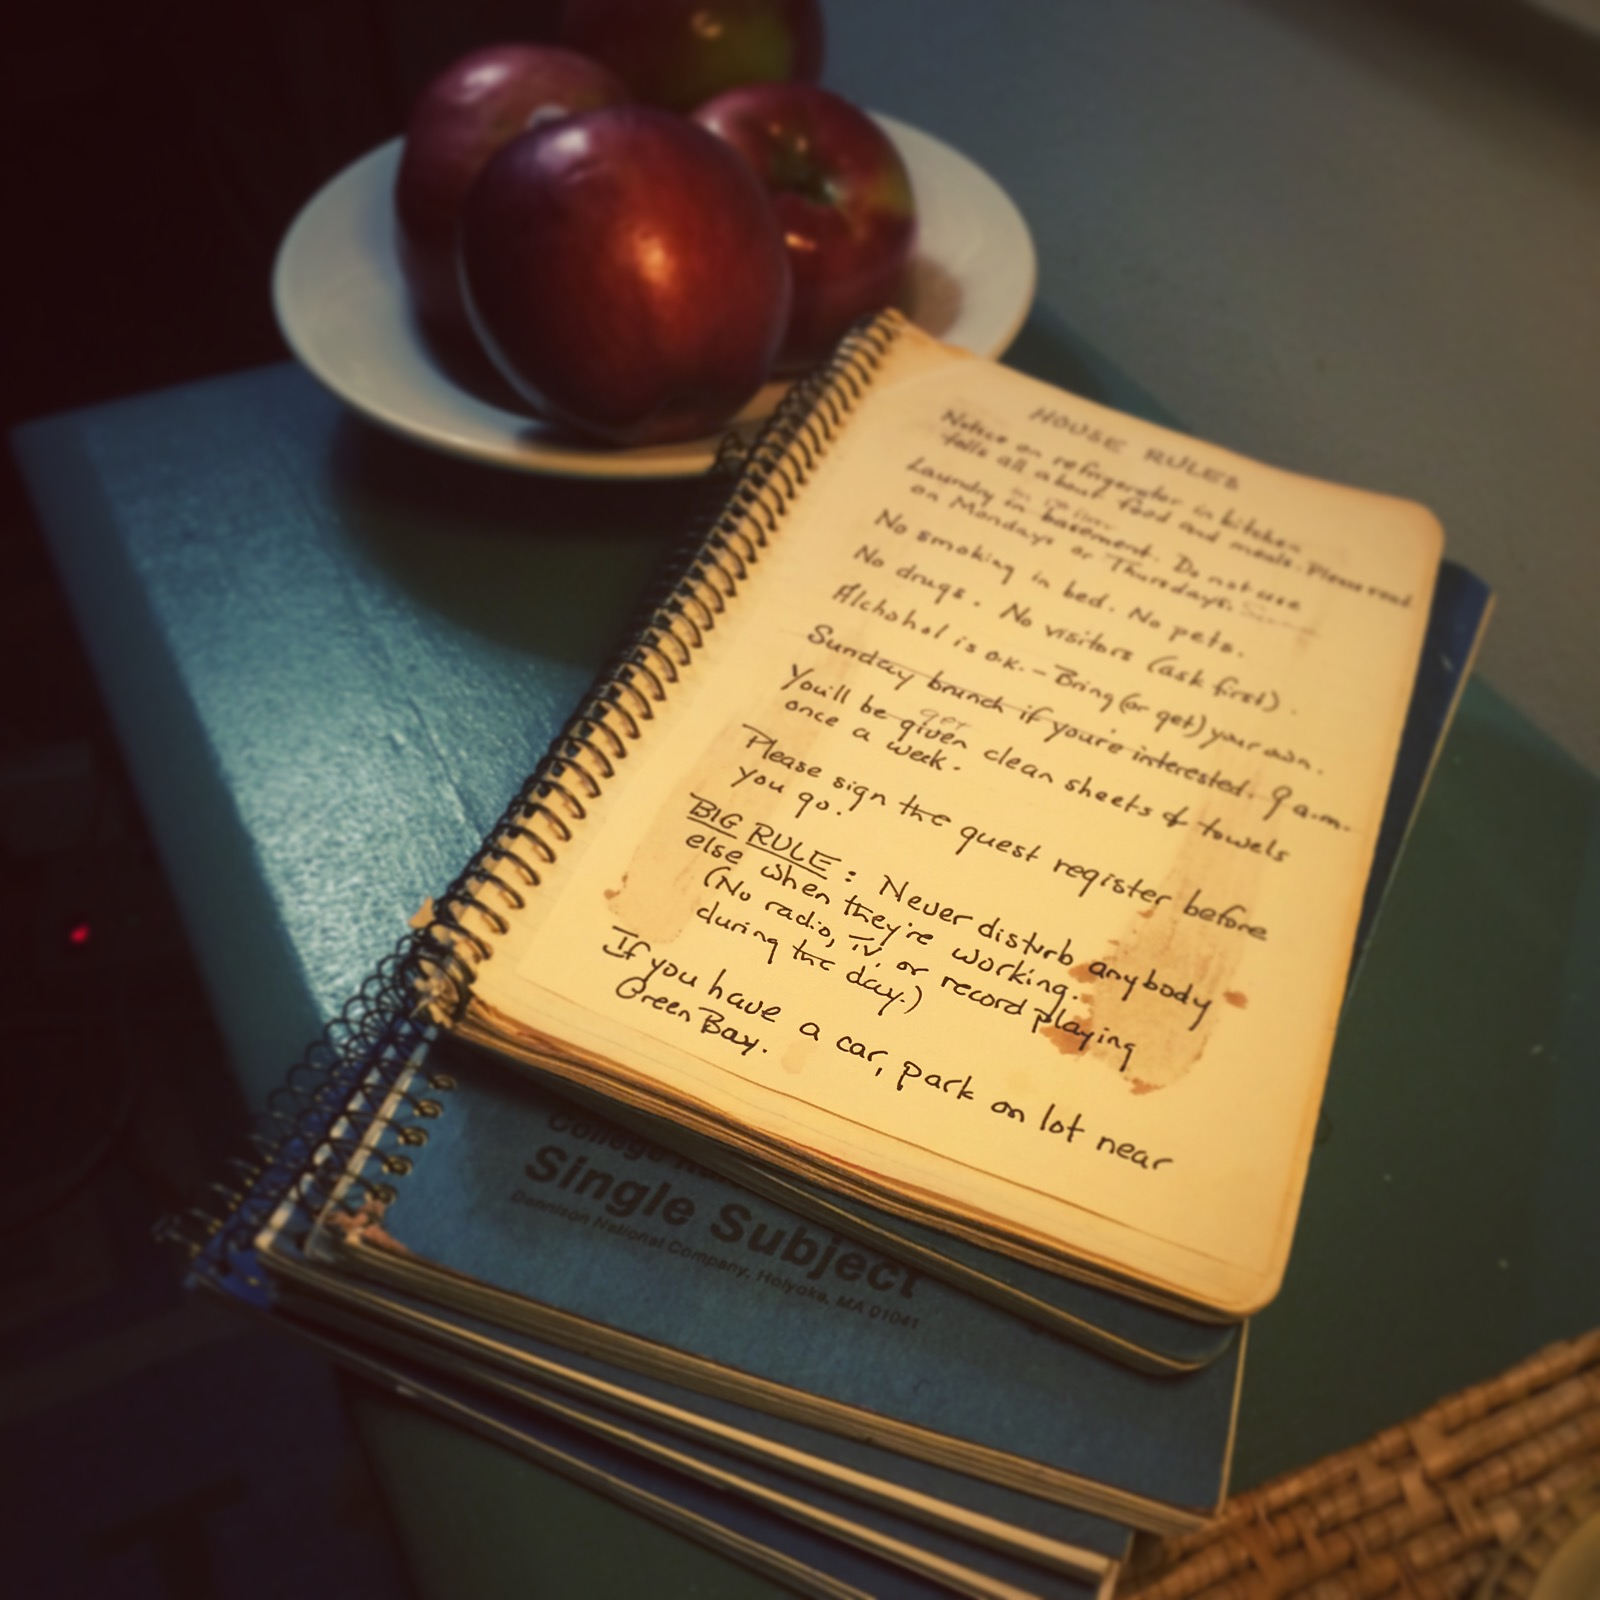 Beach Room journals, from 1981-Feb, 2015